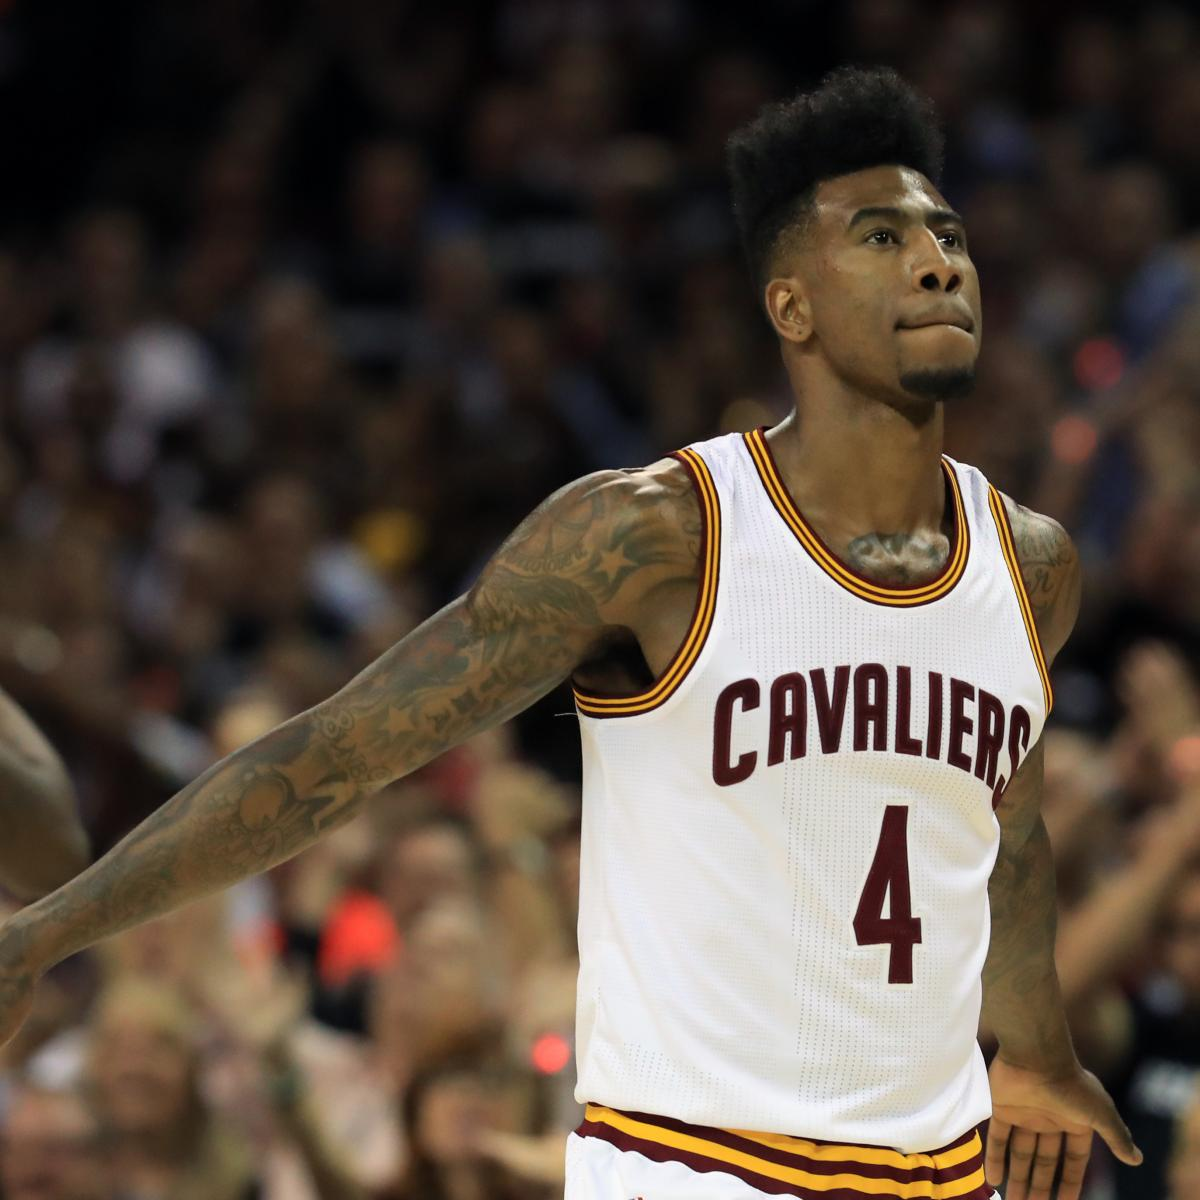 Houston Rockets Iman Shumpert: Iman Shumpert Trade Rumors: Cavaliers Trying To Trade SG